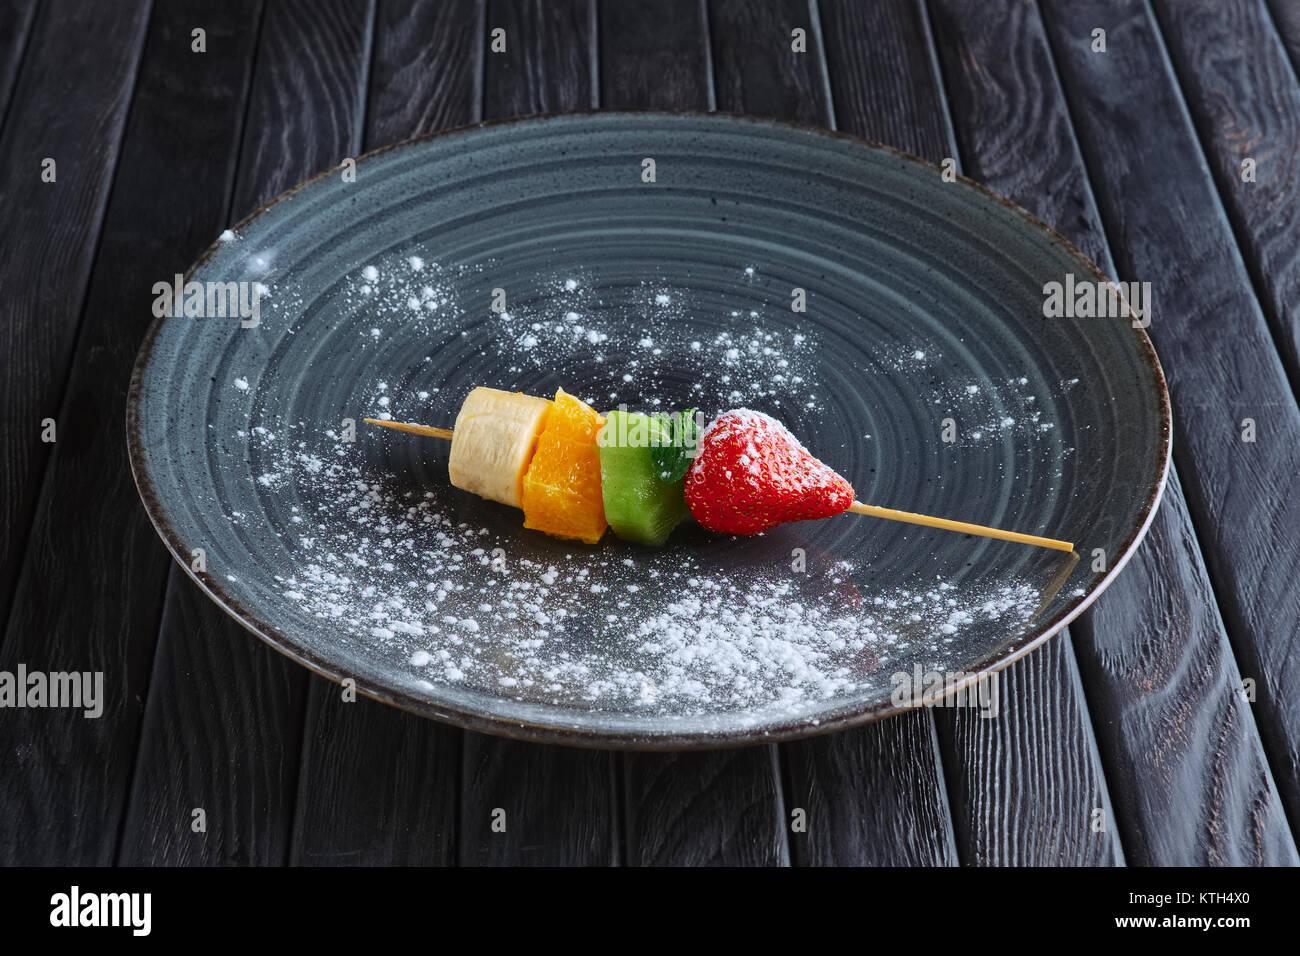 Appetizer for reception. Fresh banana, orange, kiwi, strawberry on skewer - Stock Image